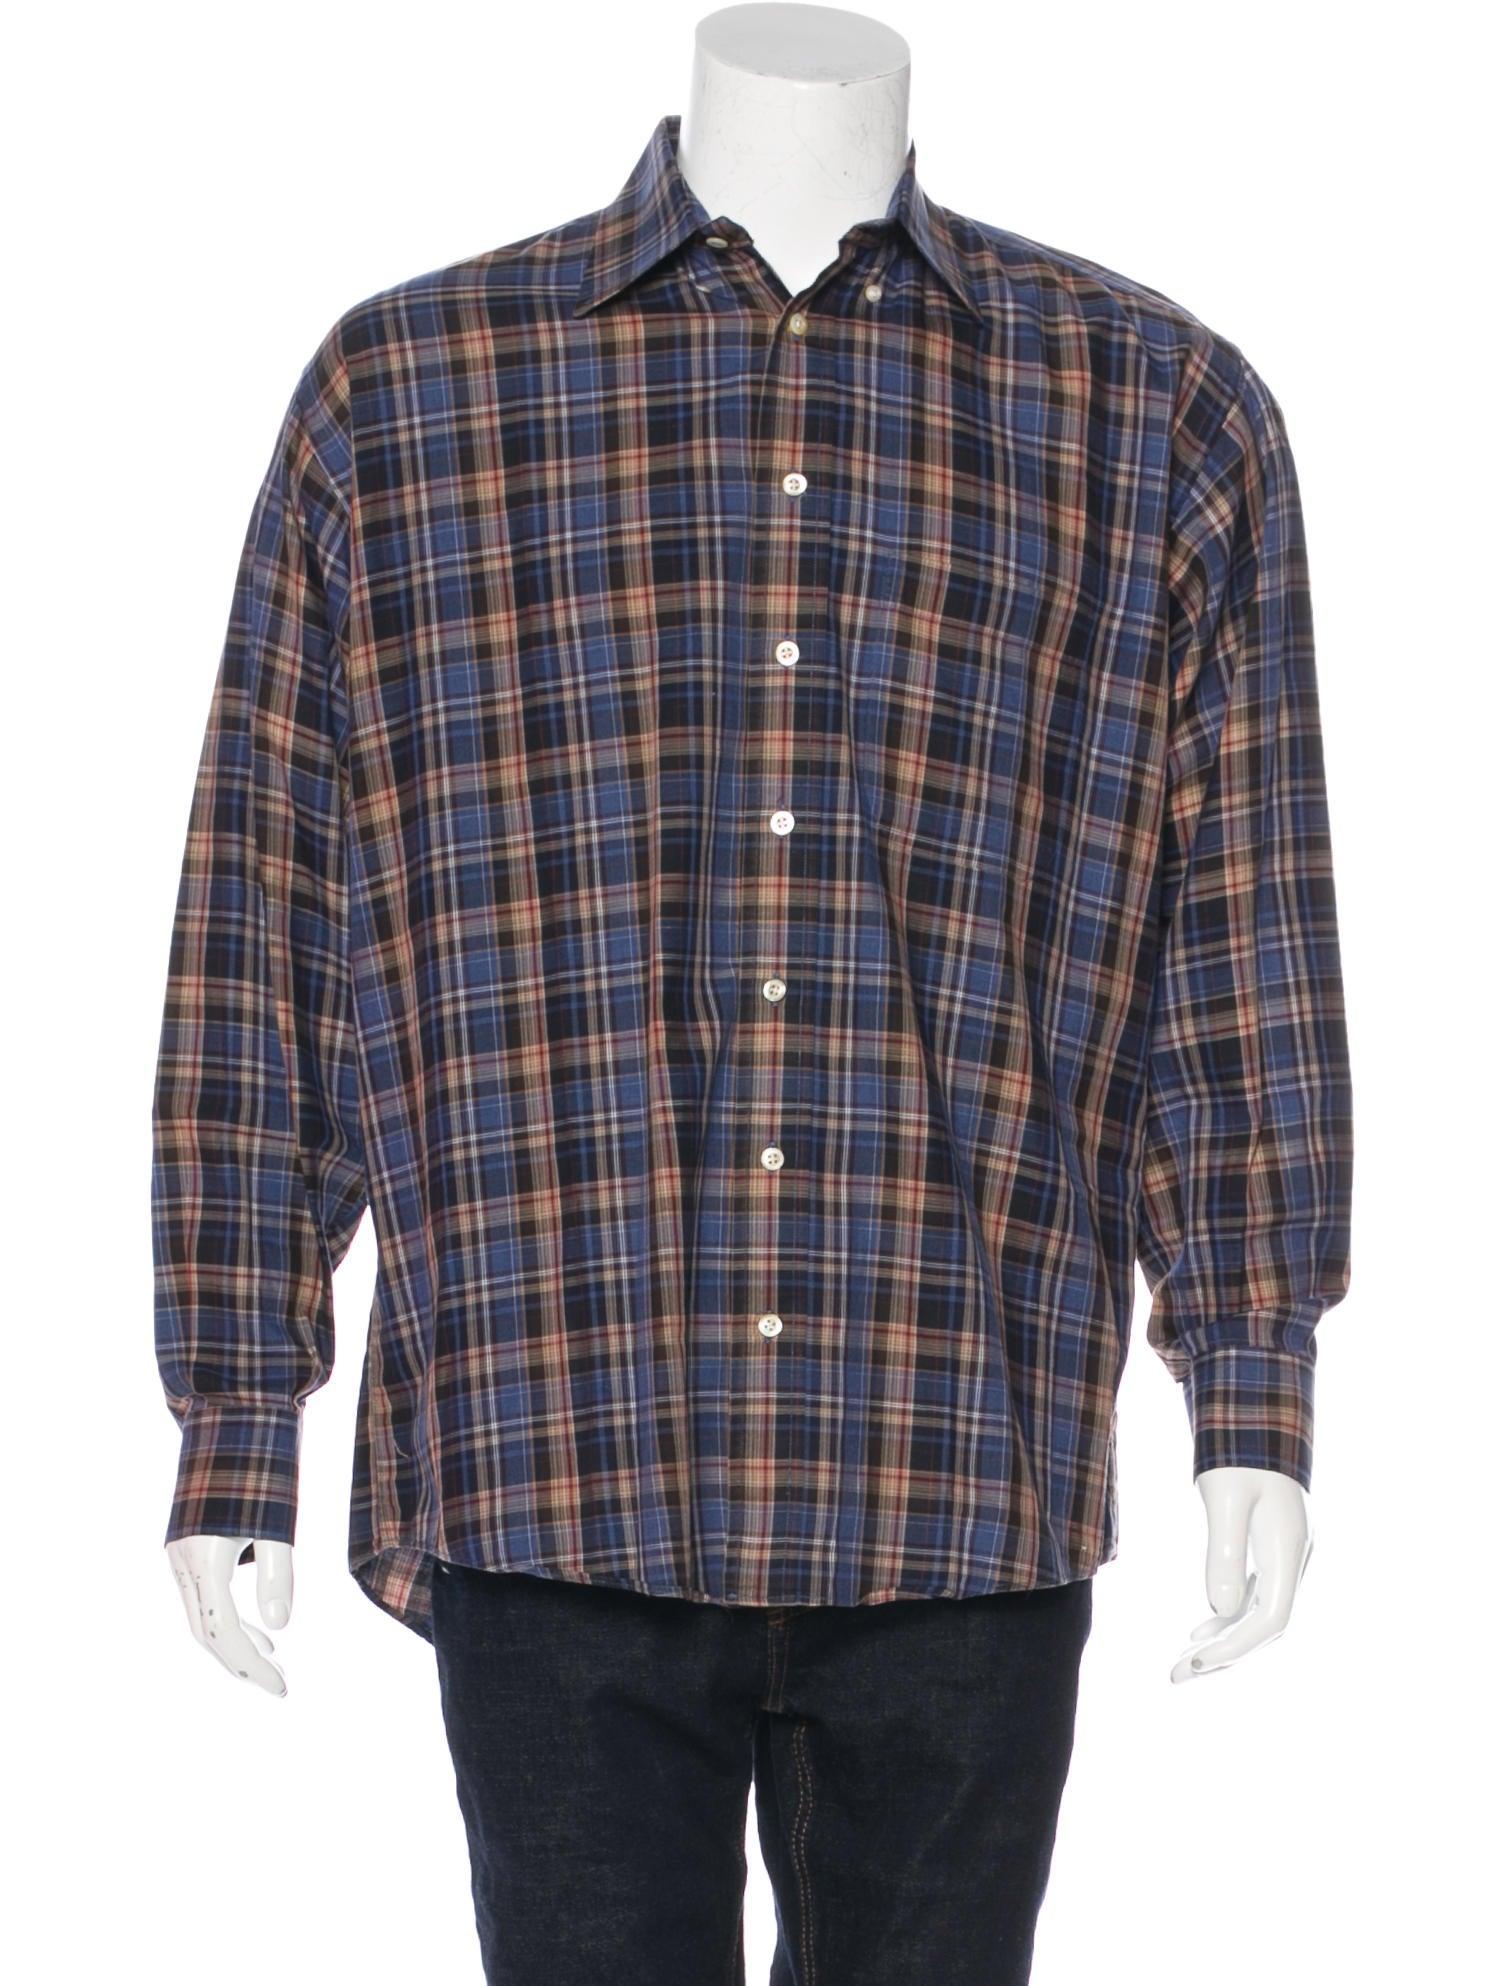 Burberry London Plaid Woven Shirt Clothing Wburl28665